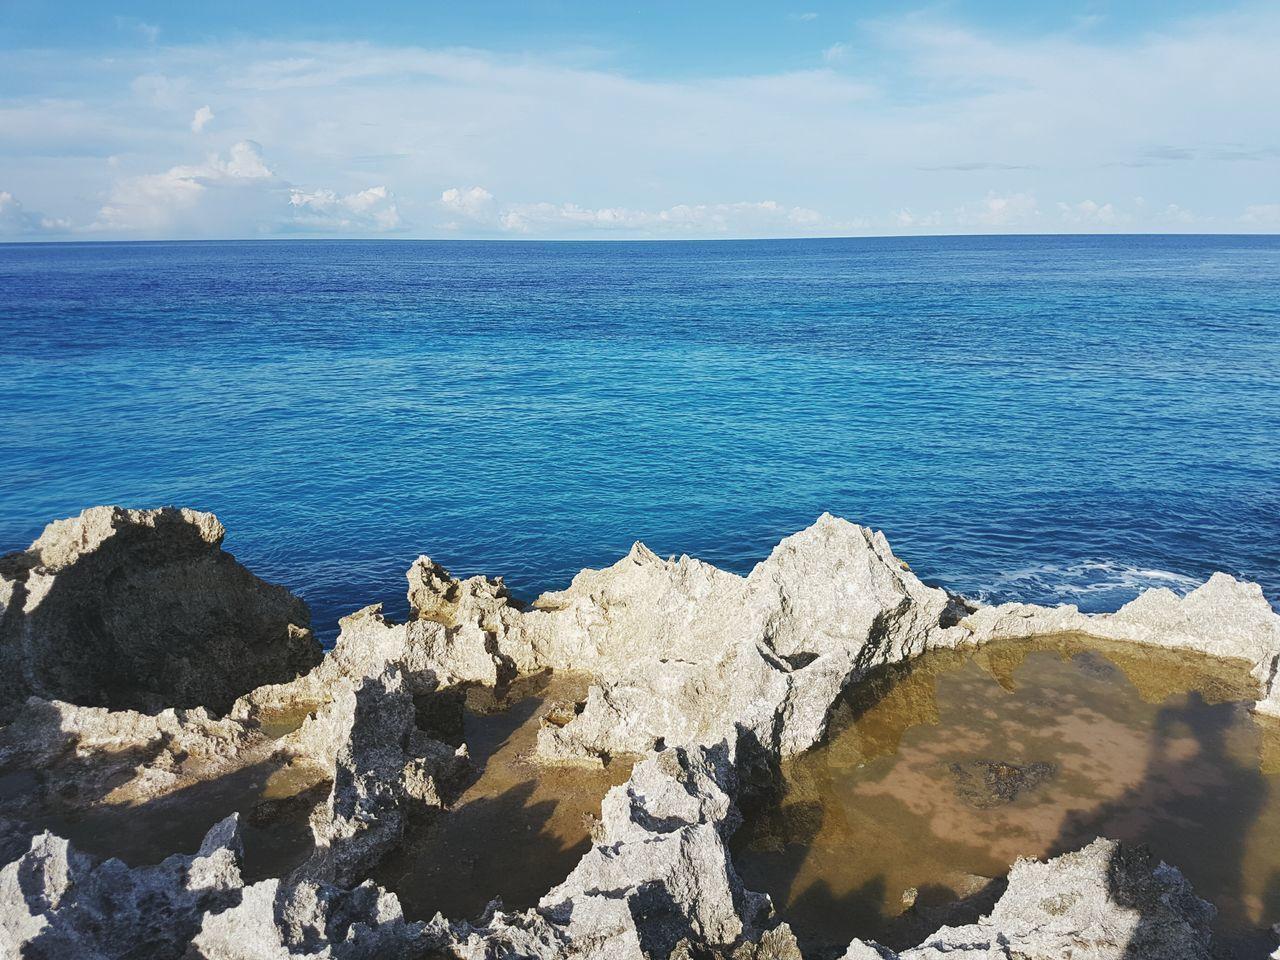 EyeEm Selects Sea Beach Rock - Object Horizon Over Water Scenics Sky Wave Biak Papua Indonesia